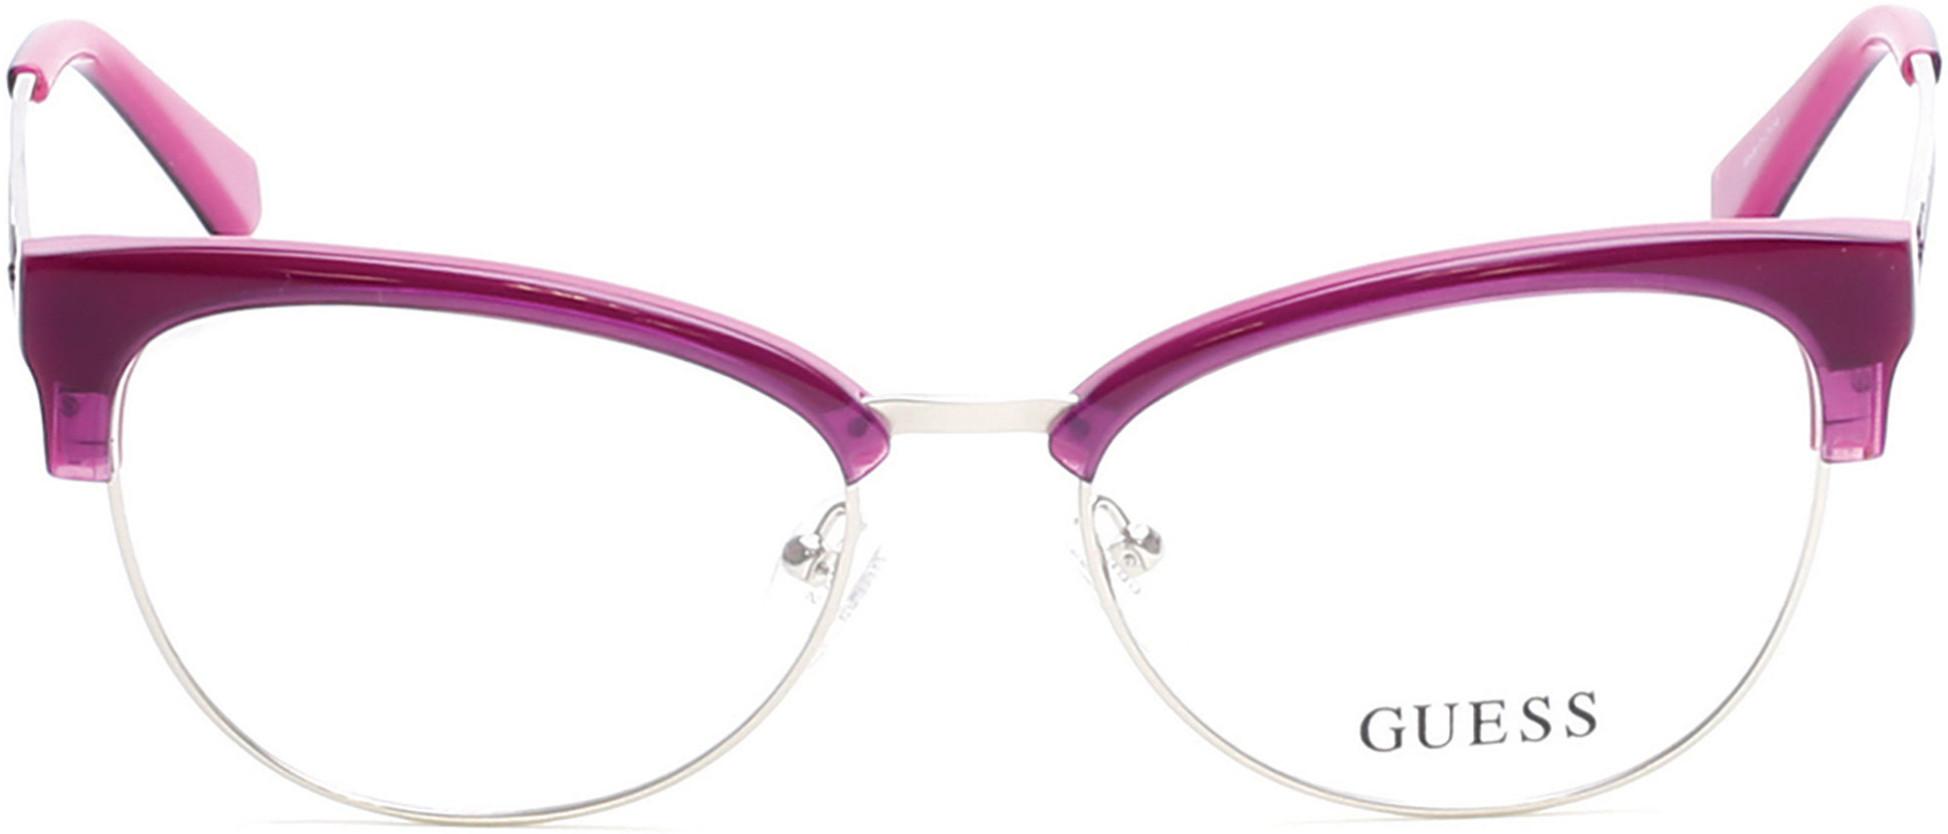 pink guess glasses prescription designer